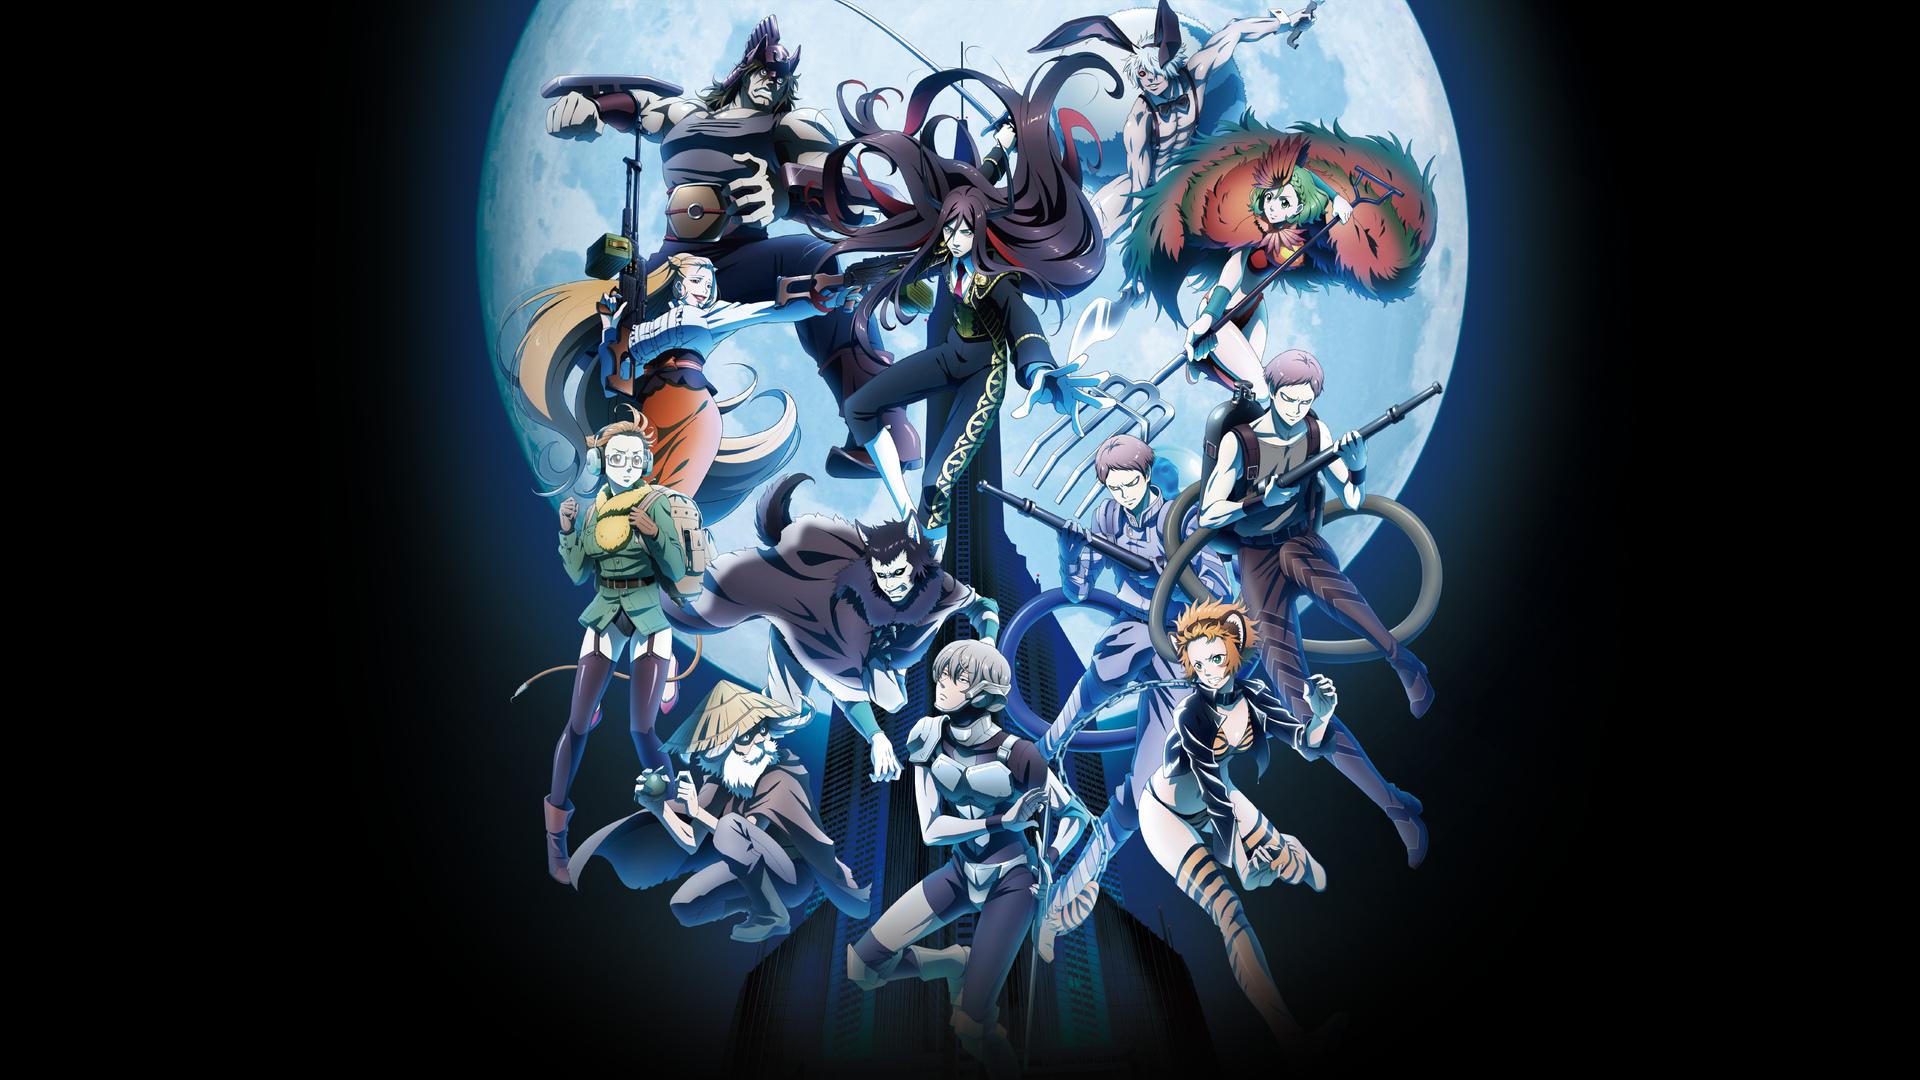 Wallpaper Juuni Taisen, anime, characters